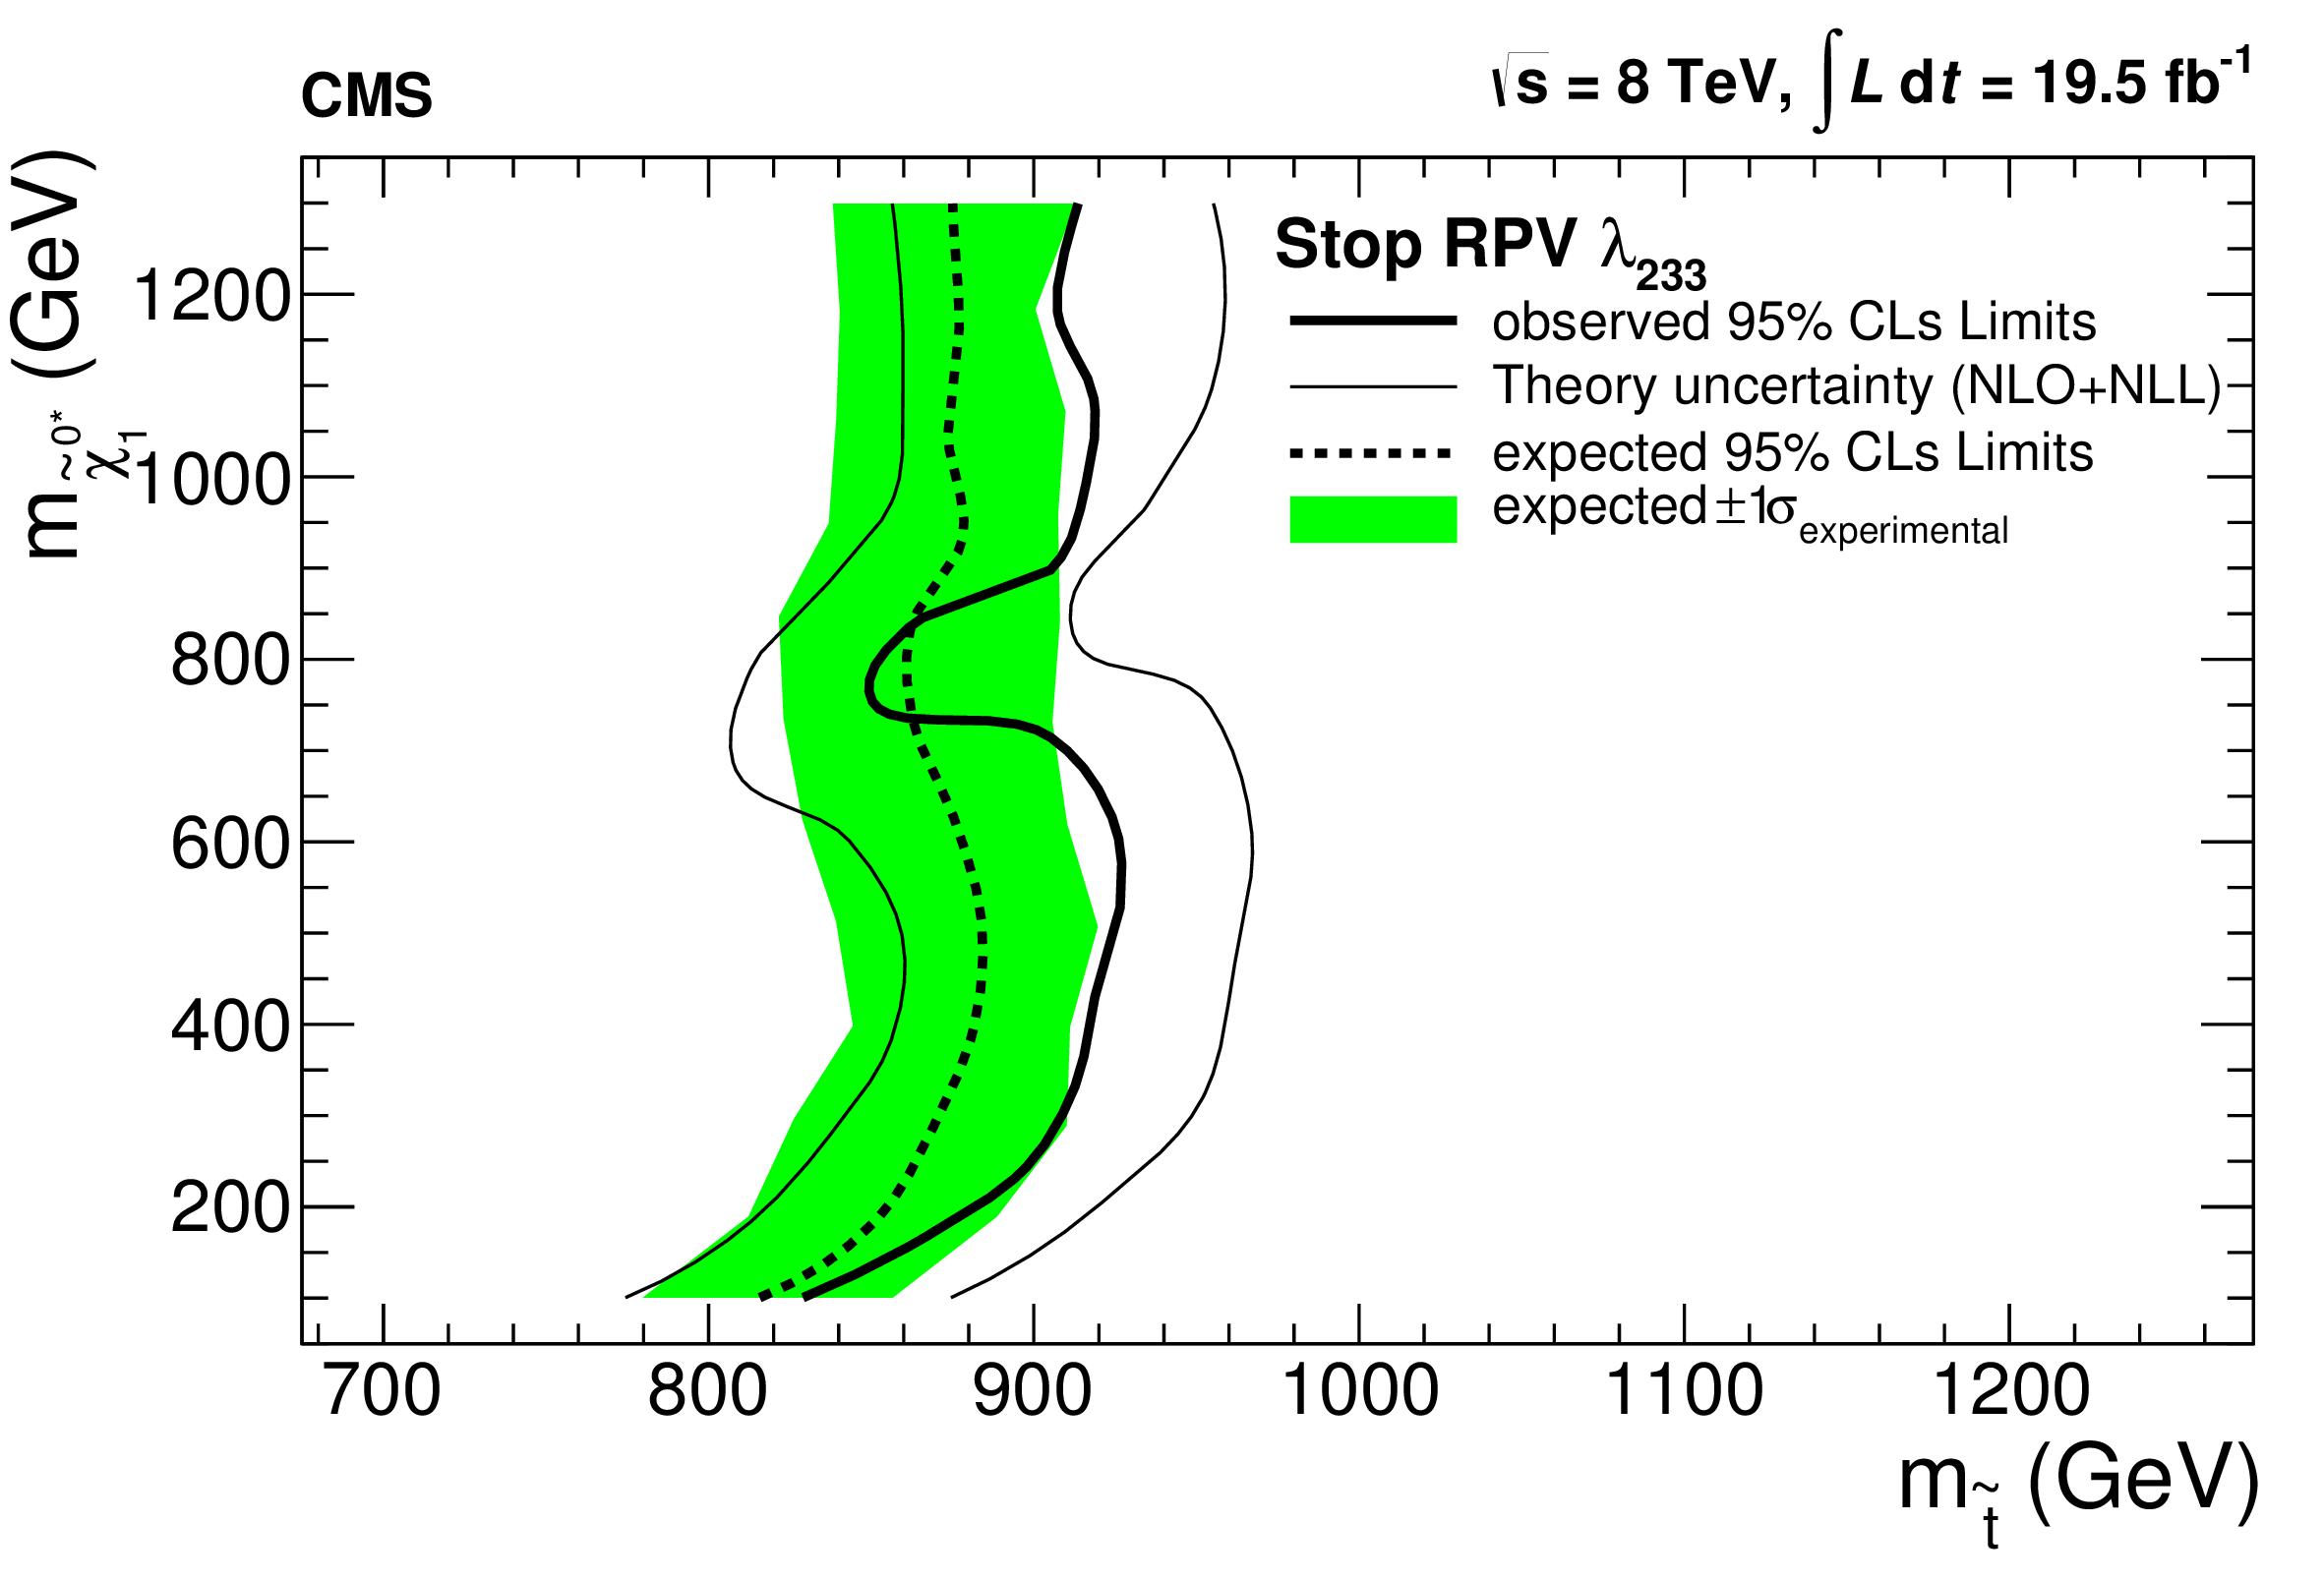 curve_StopRPV_LLE233.png